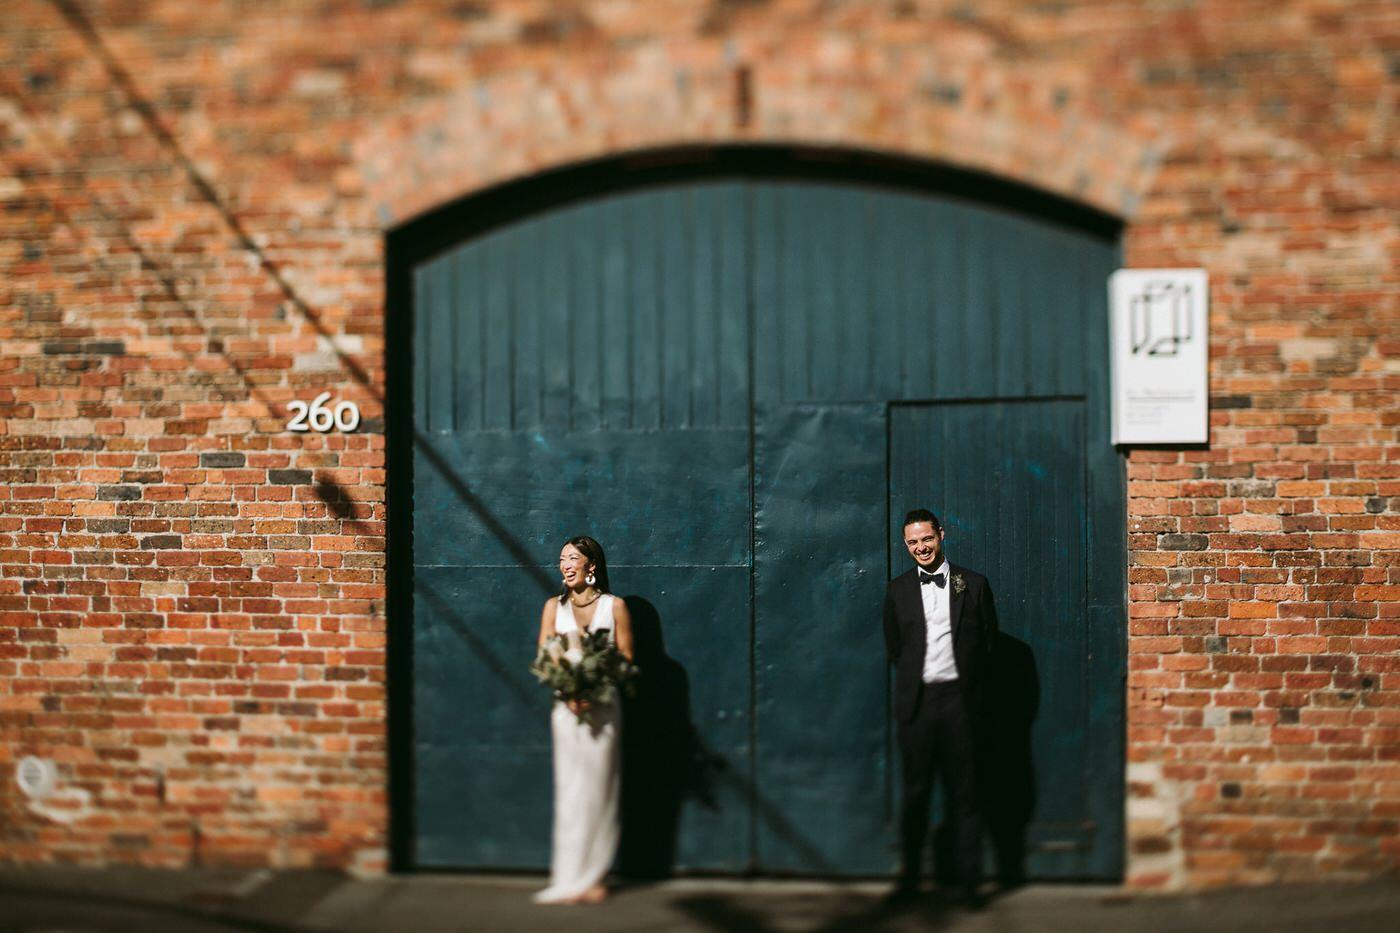 GoldandGrit_KimMatt_Panama-Dining-Room-Fitzroy-Collingwood-Relaxed-Fun-Candid-Wedding-Photography_42.jpg